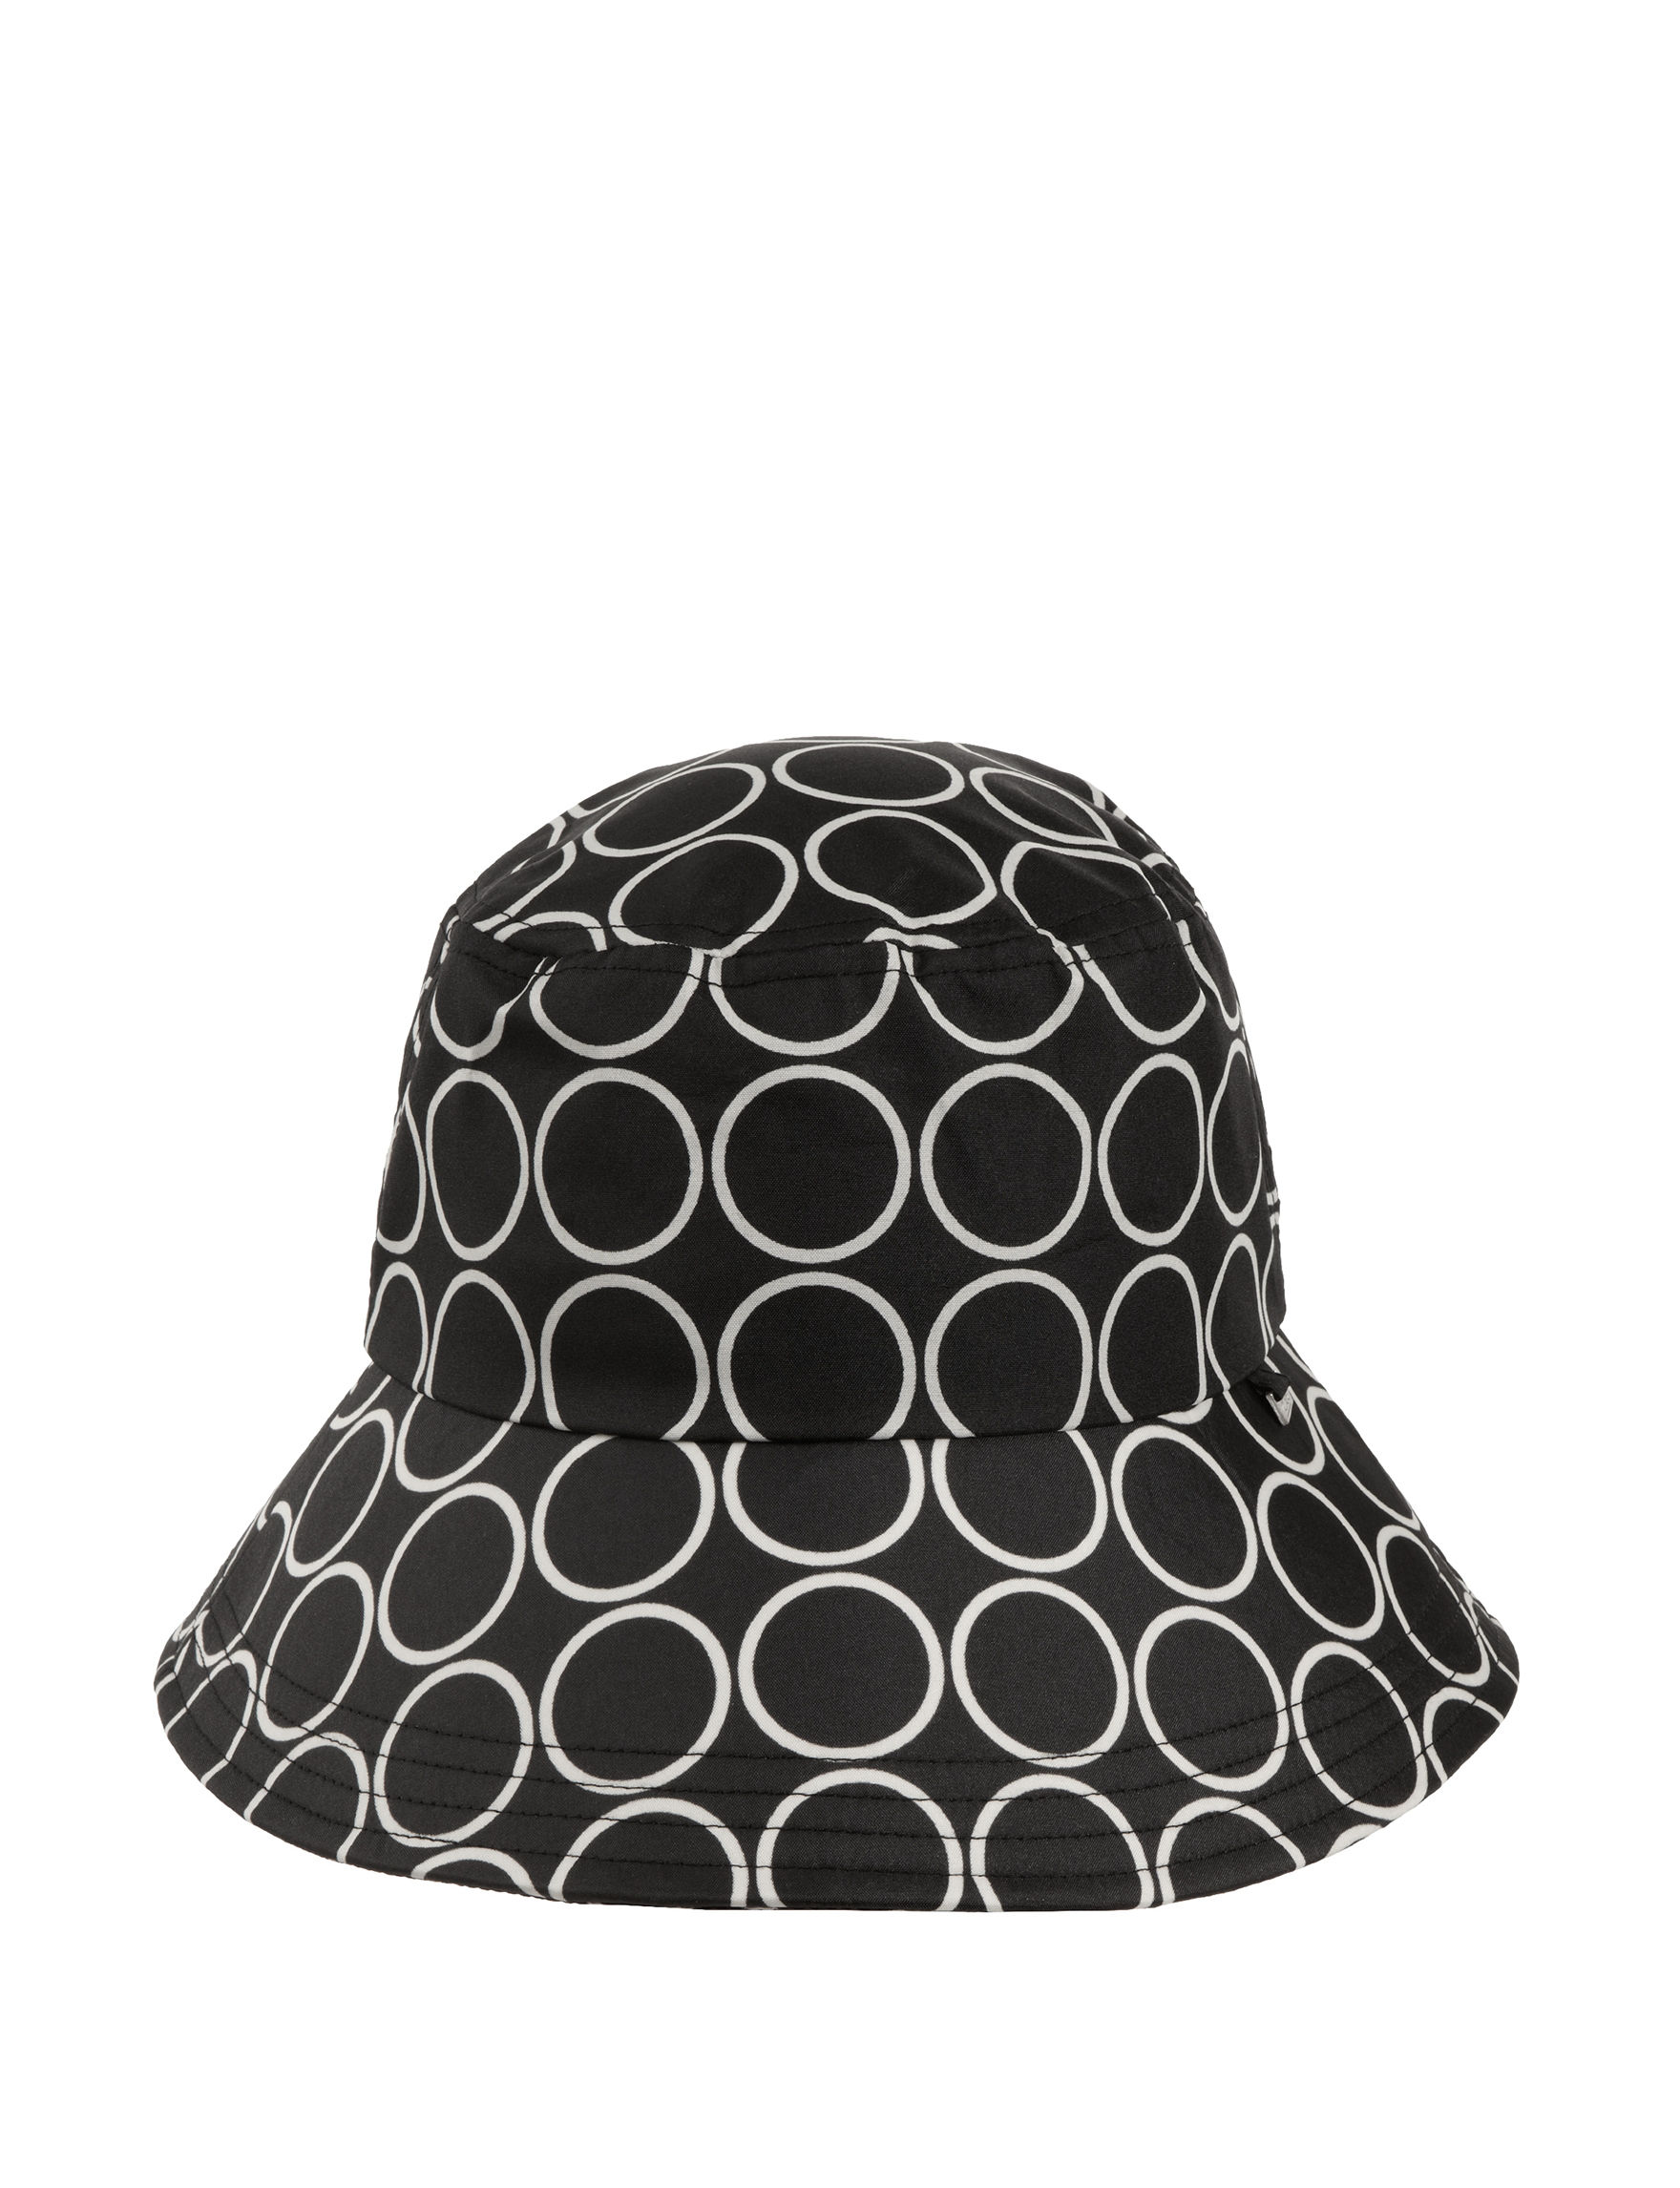 Isotoner White Hats & Headwear